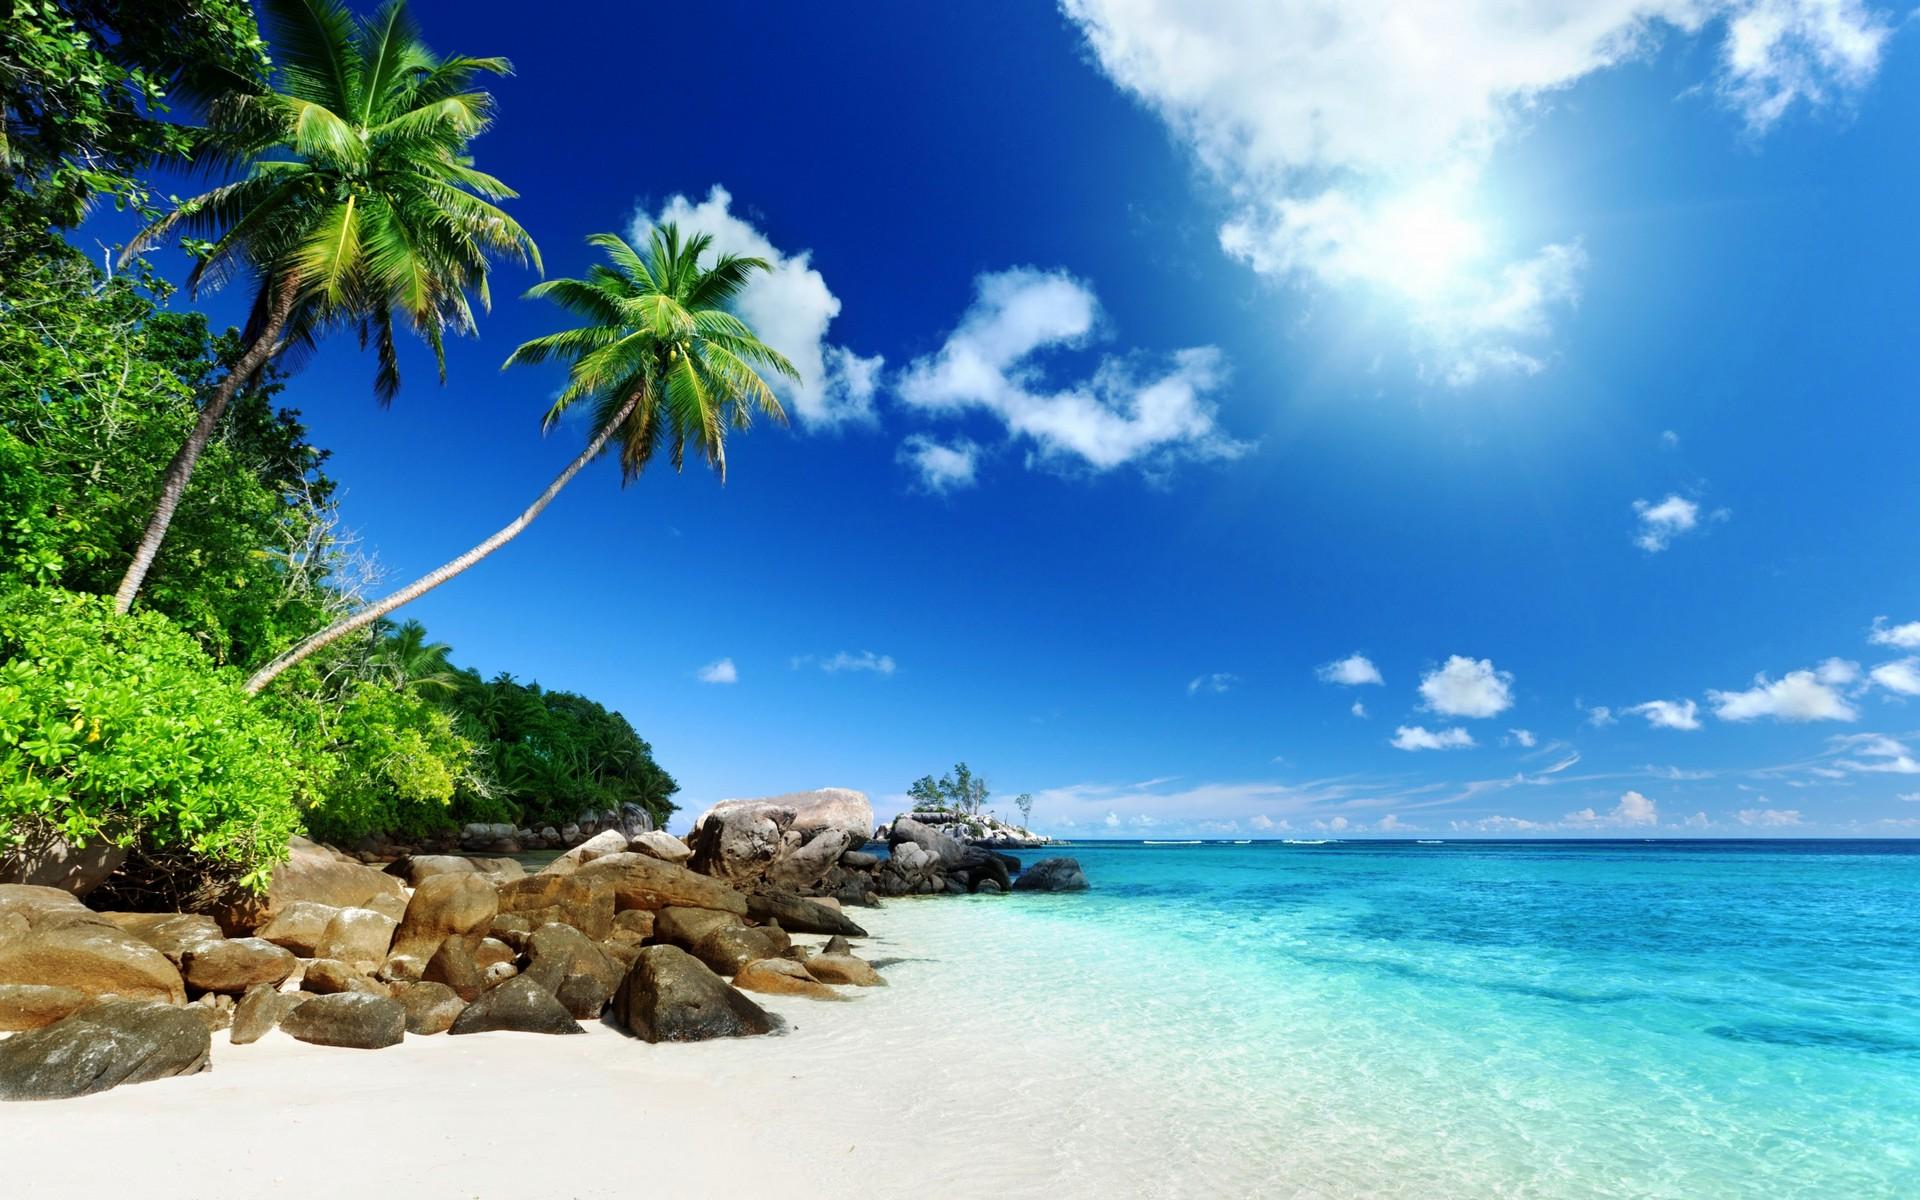 Tropical Island Desktop Wallpaper 1920x1200